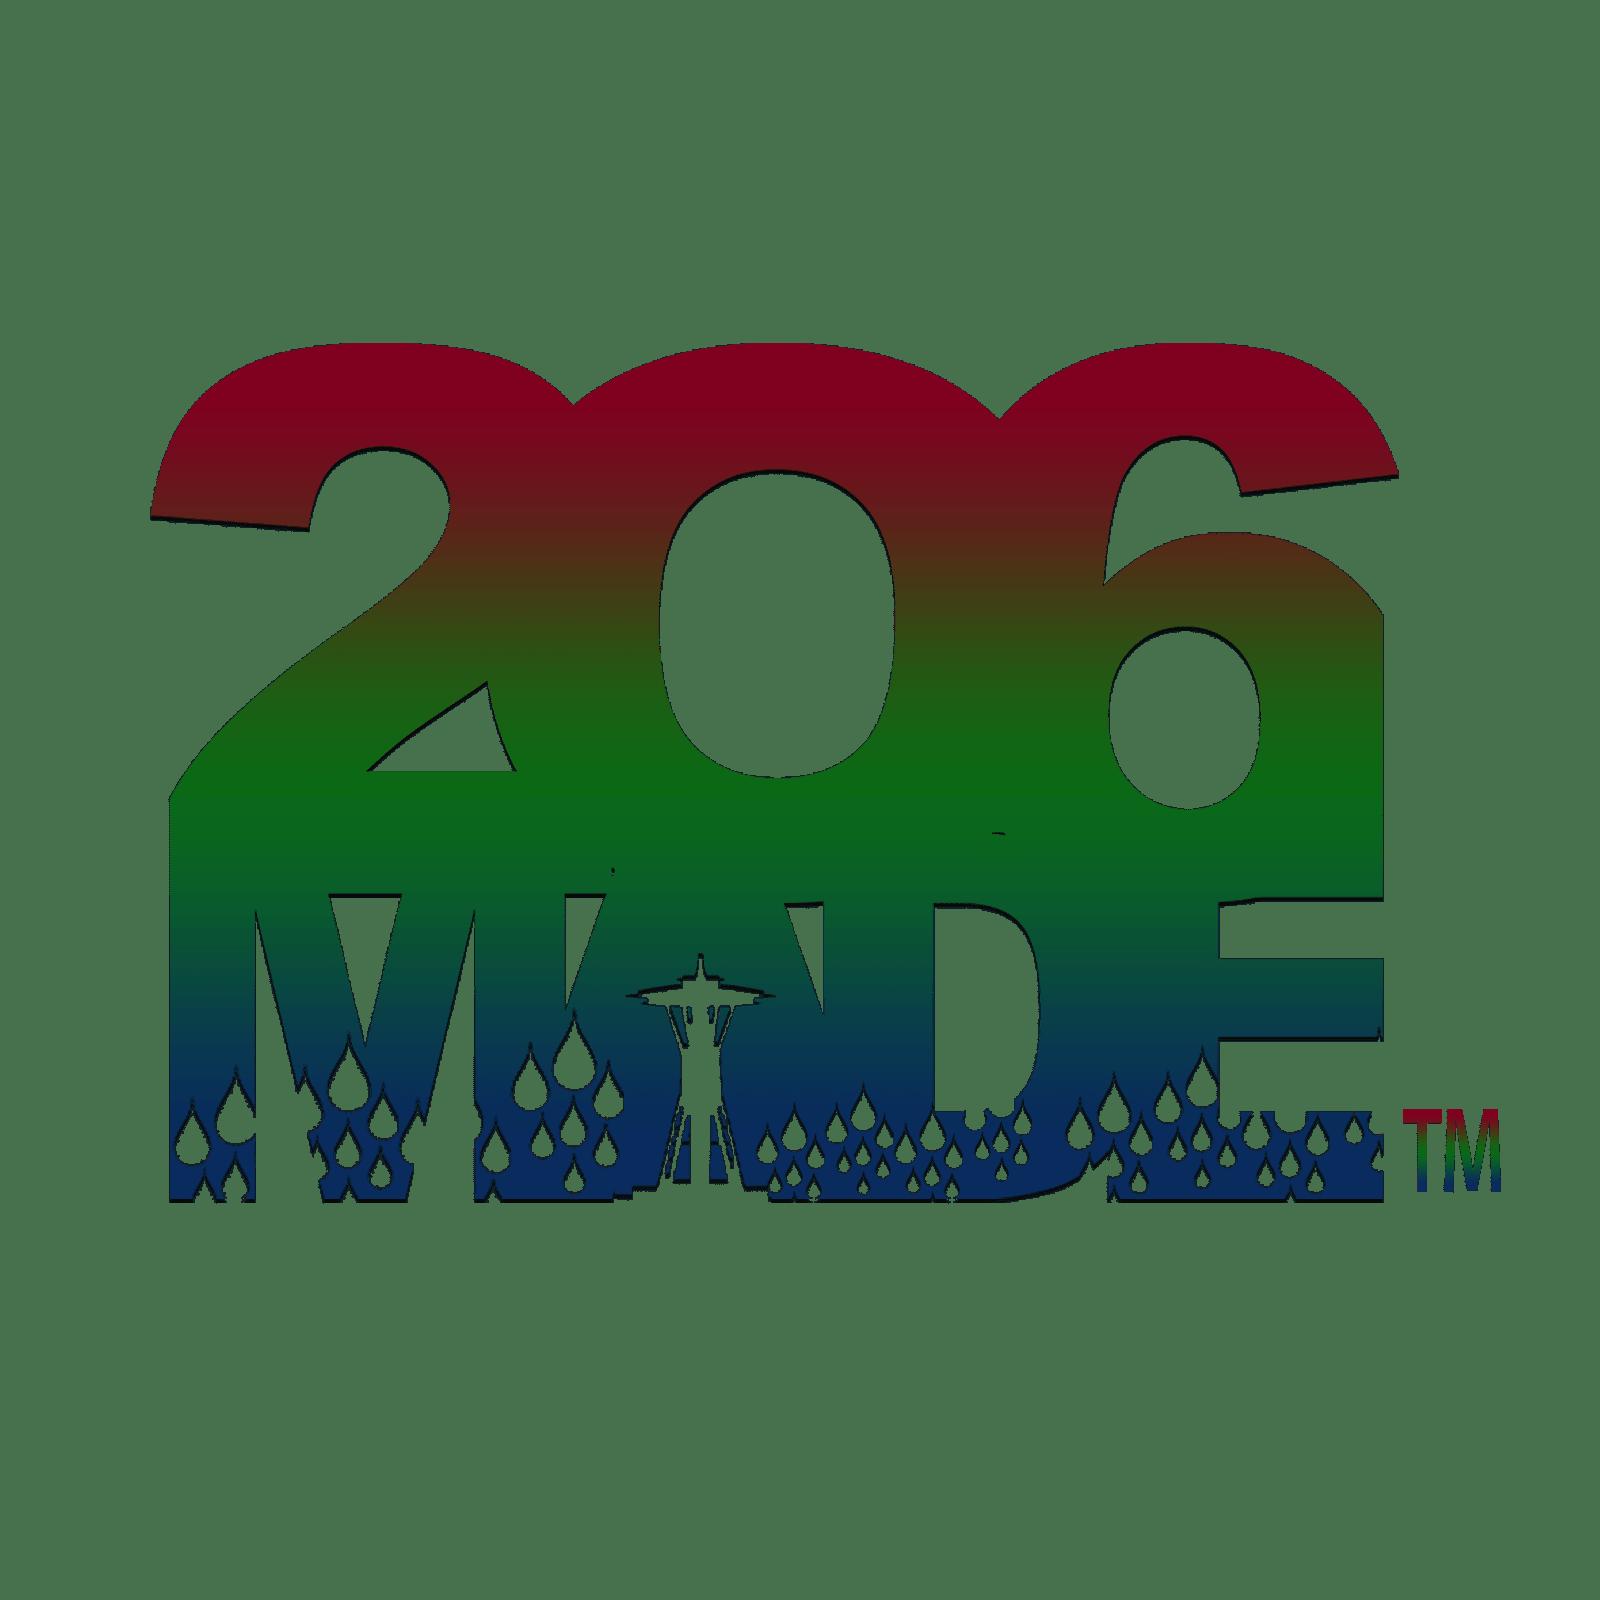 206 Made